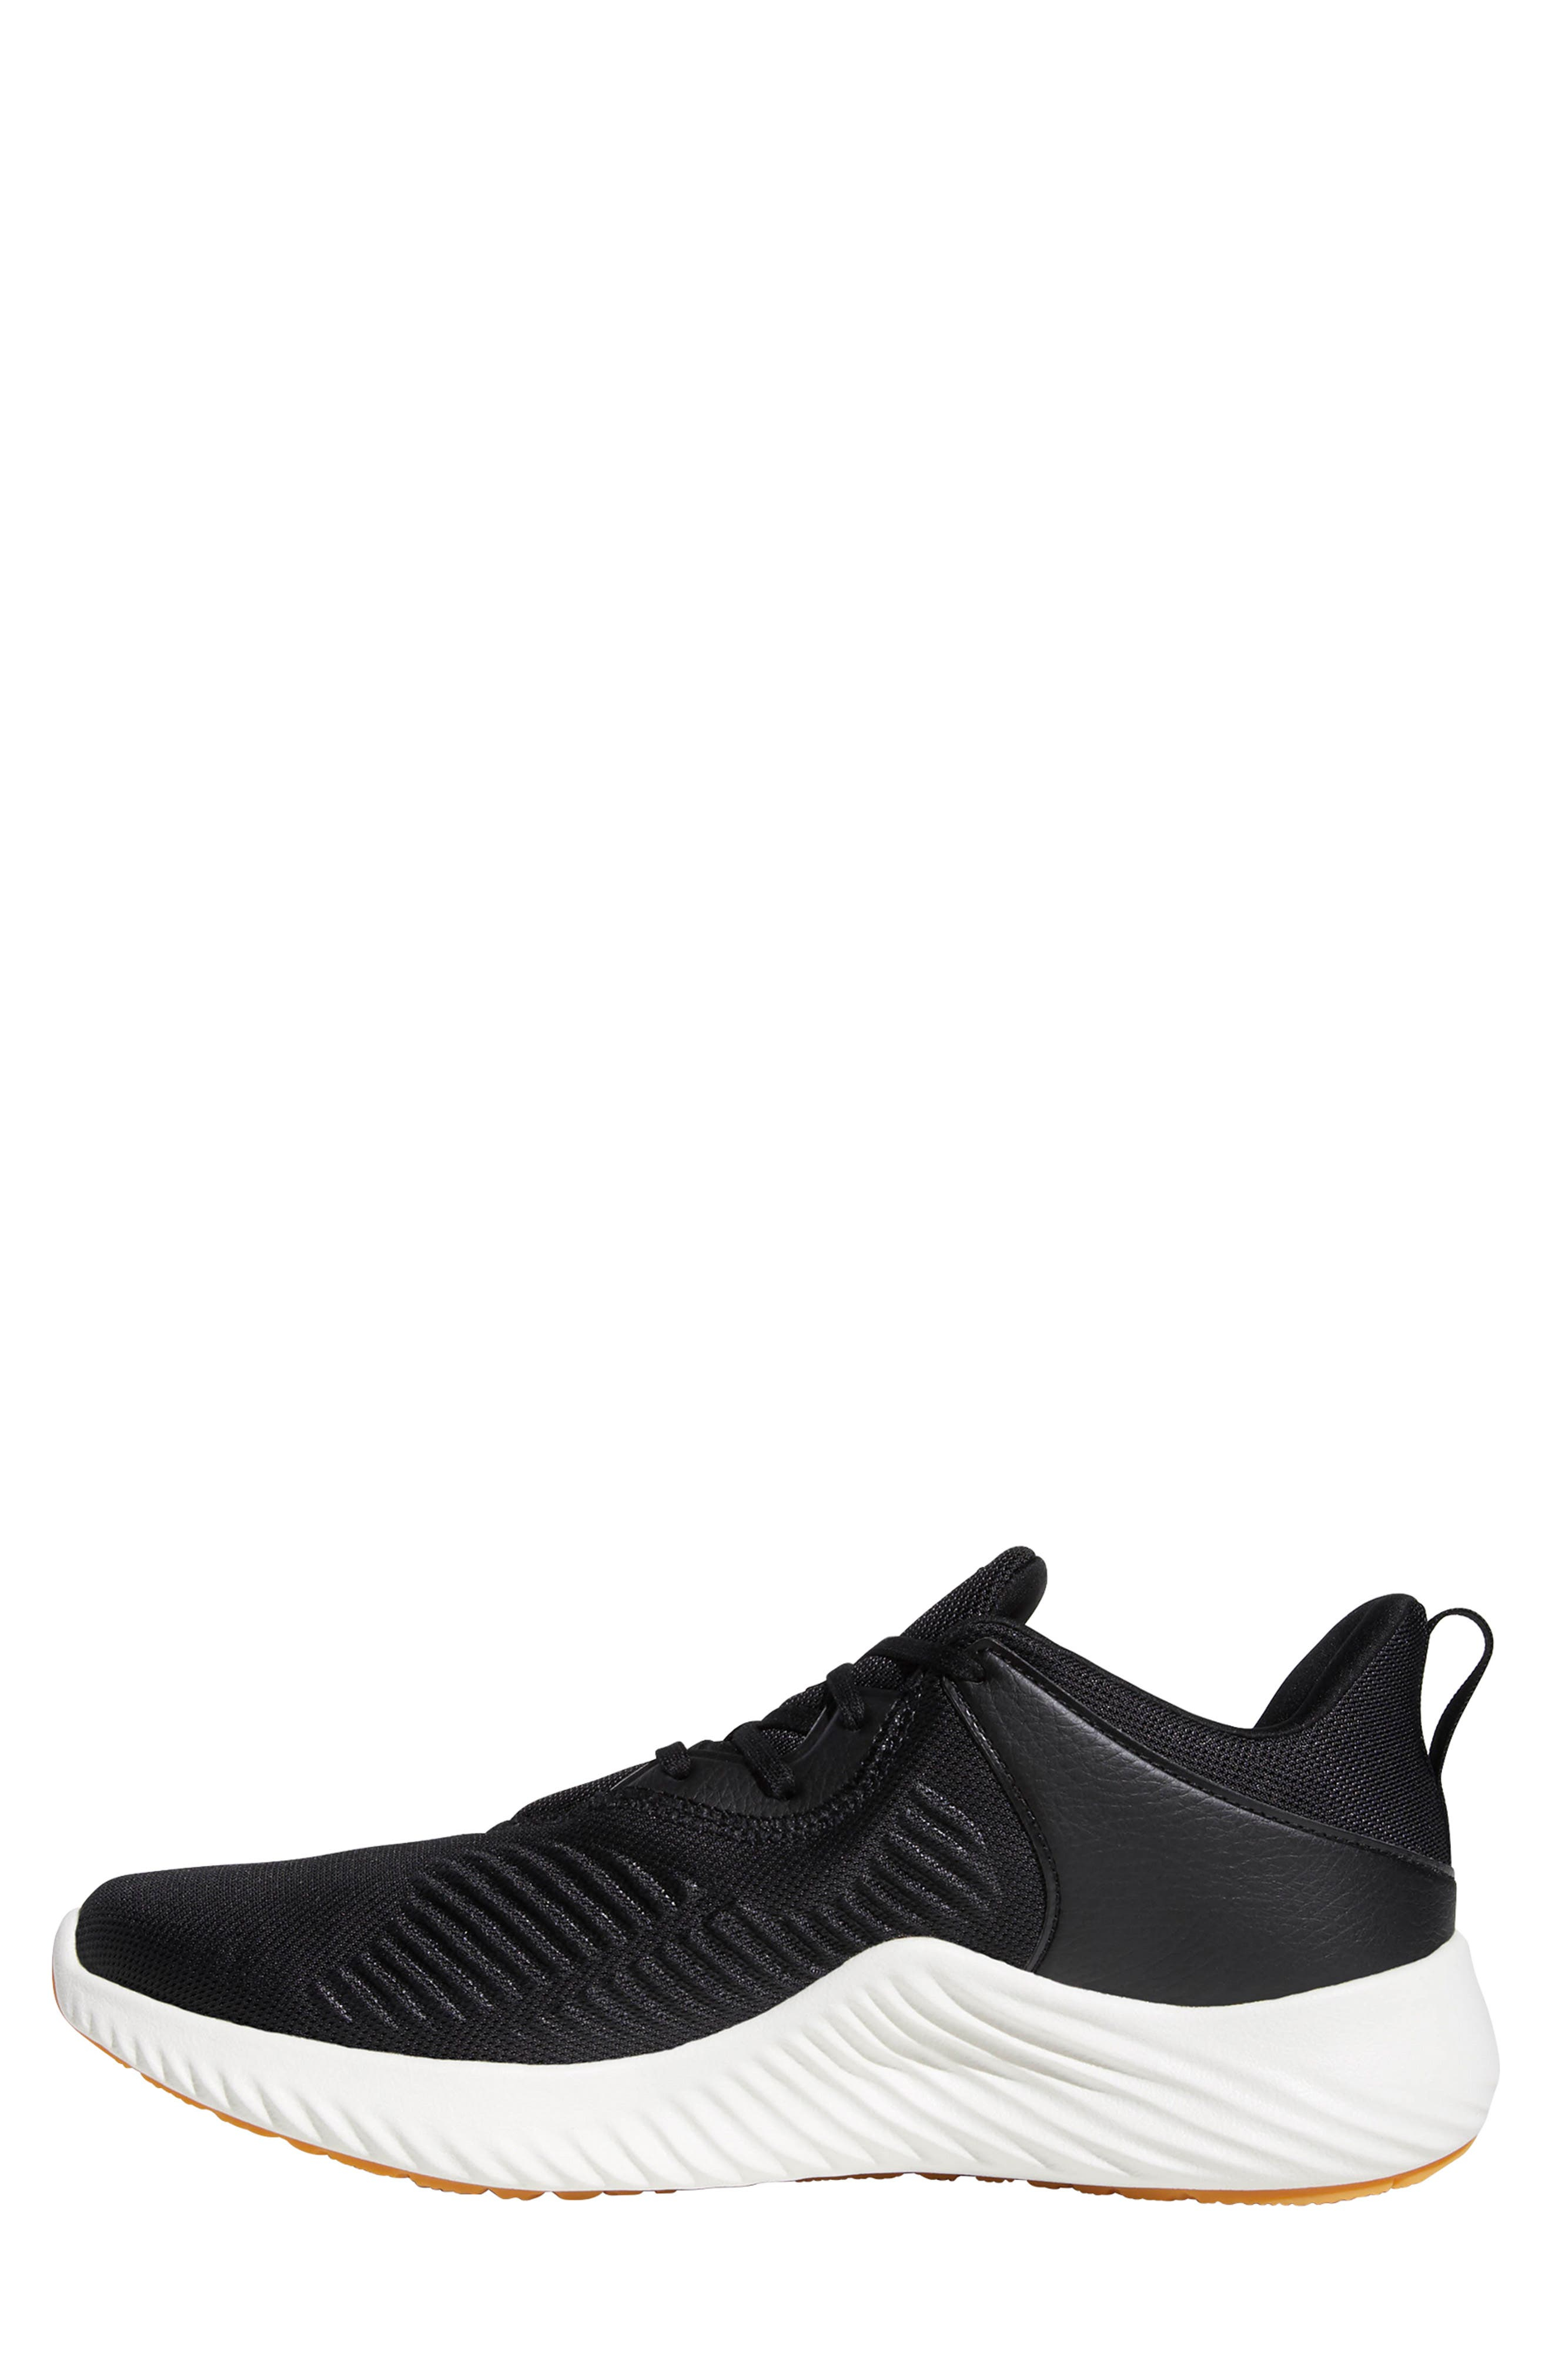 AlphaBounce RC 2 Running Shoe,                             Alternate thumbnail 10, color,                             CORE BLACK/ NIGHT/ CORE BLACK